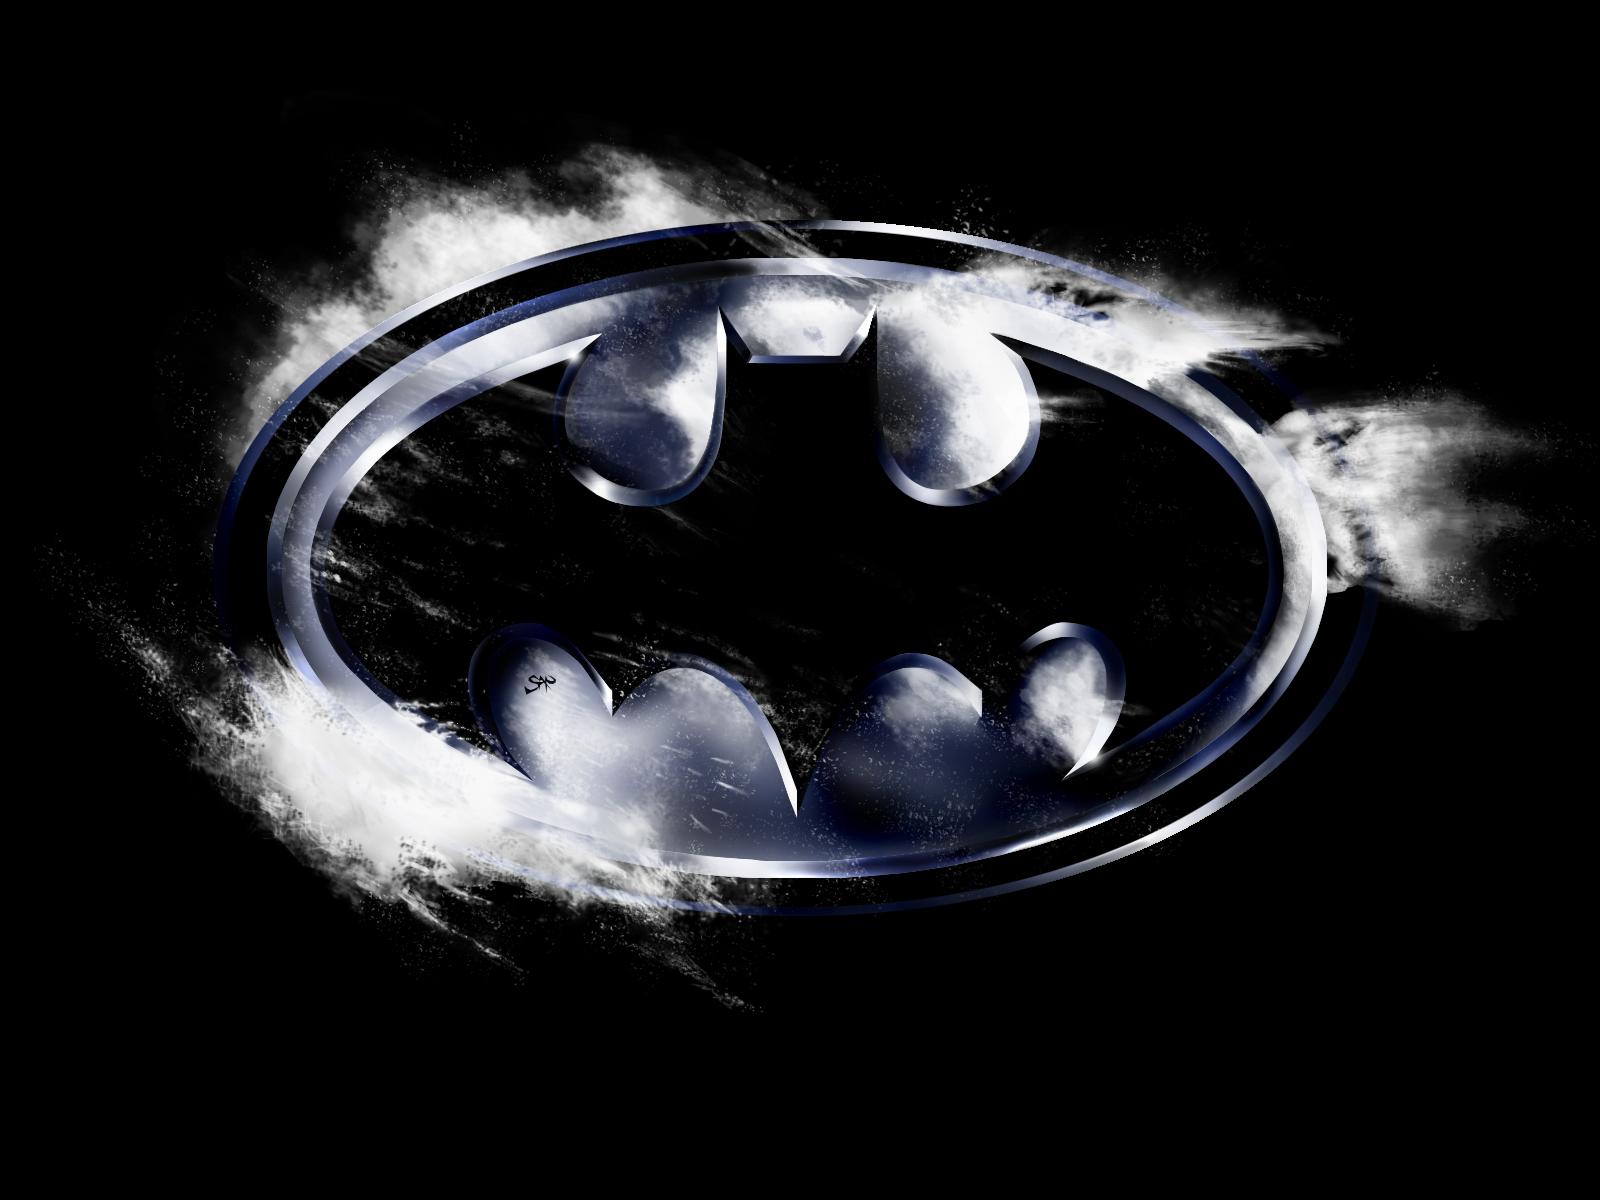 Batman Logos Dekstop HD Wallpaper Movies Wallpapers 1600x1200